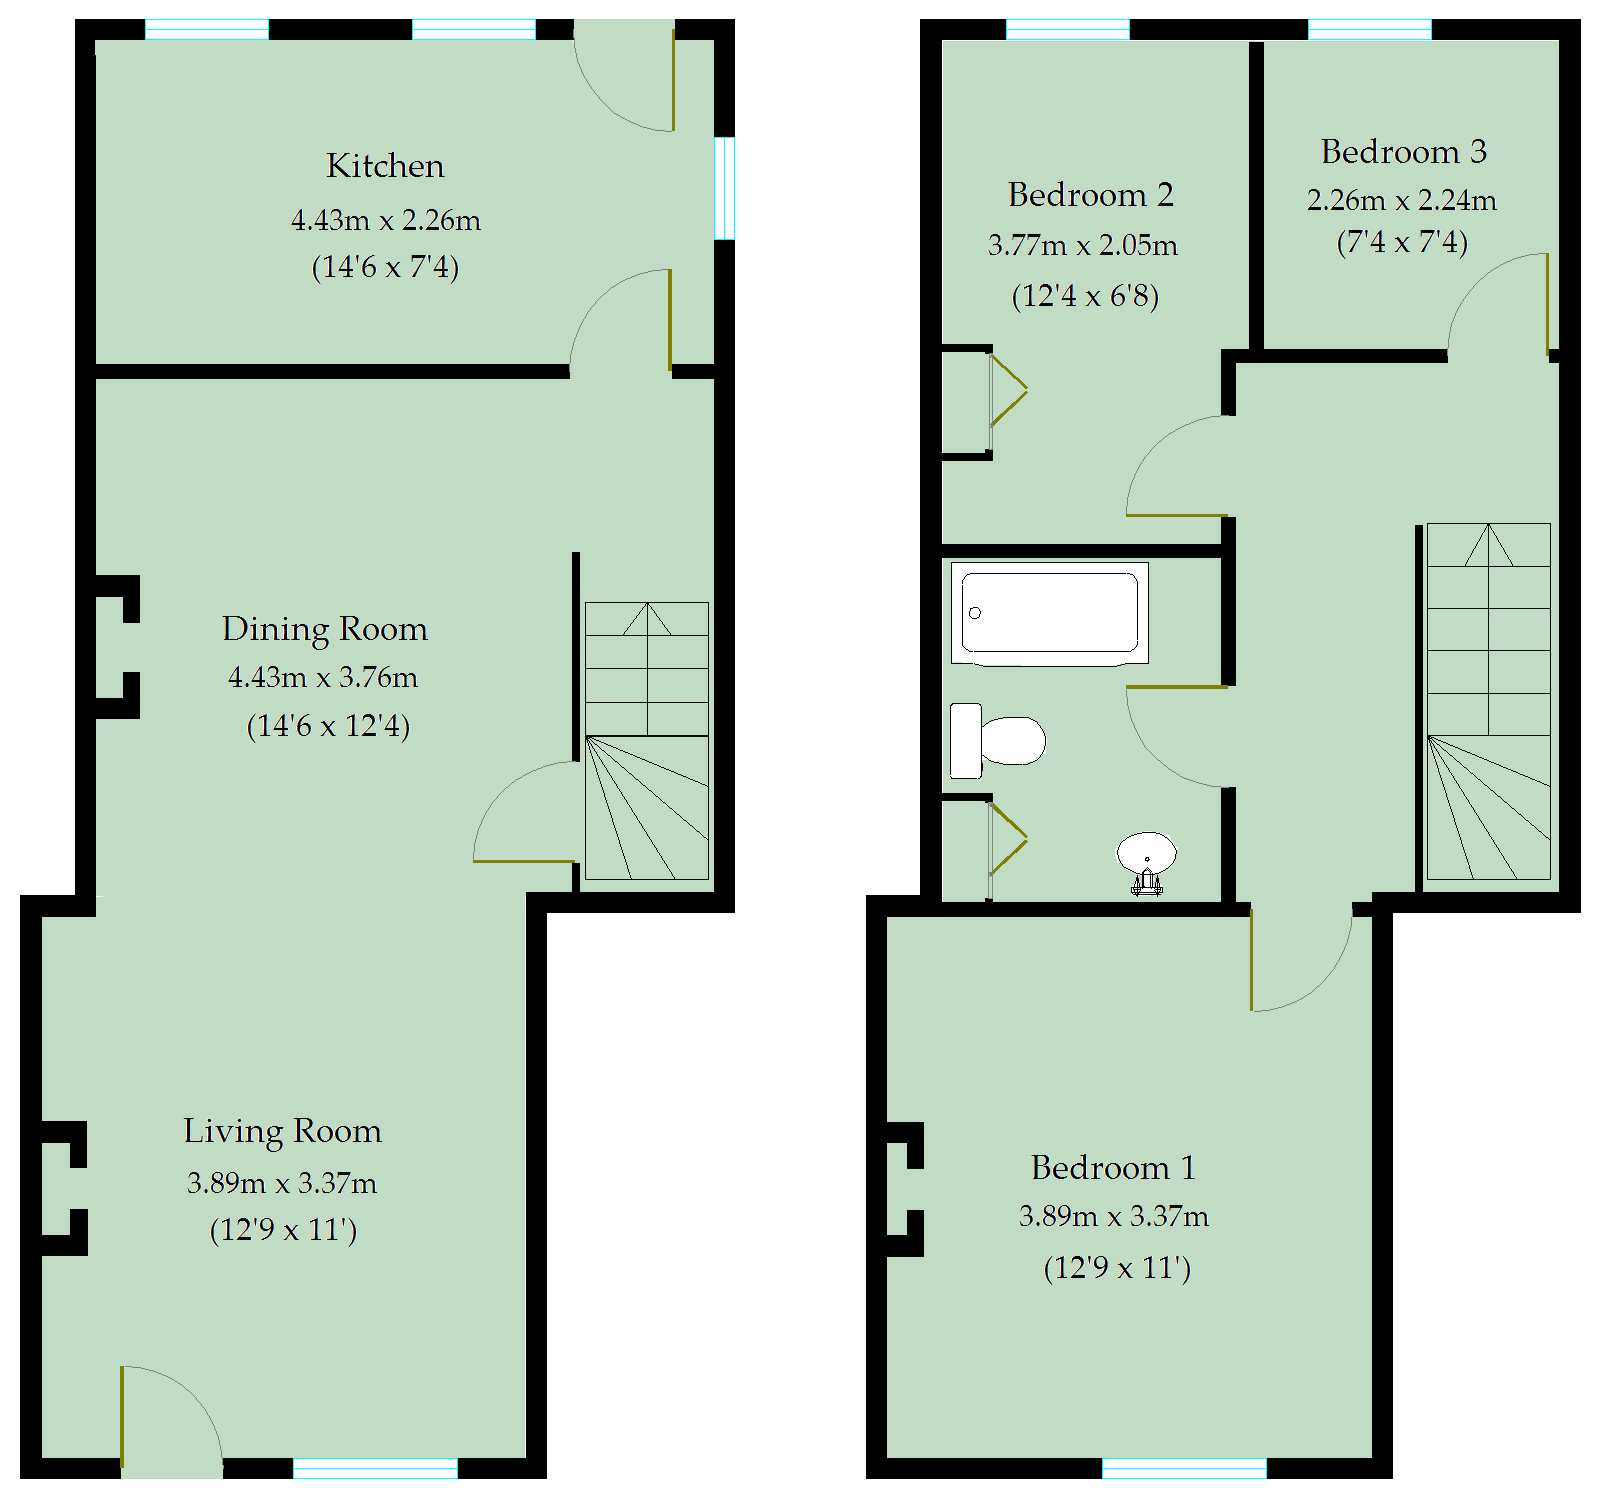 Tidcombe Lane Tiverton Ex16 3 Bedroom Terraced House For